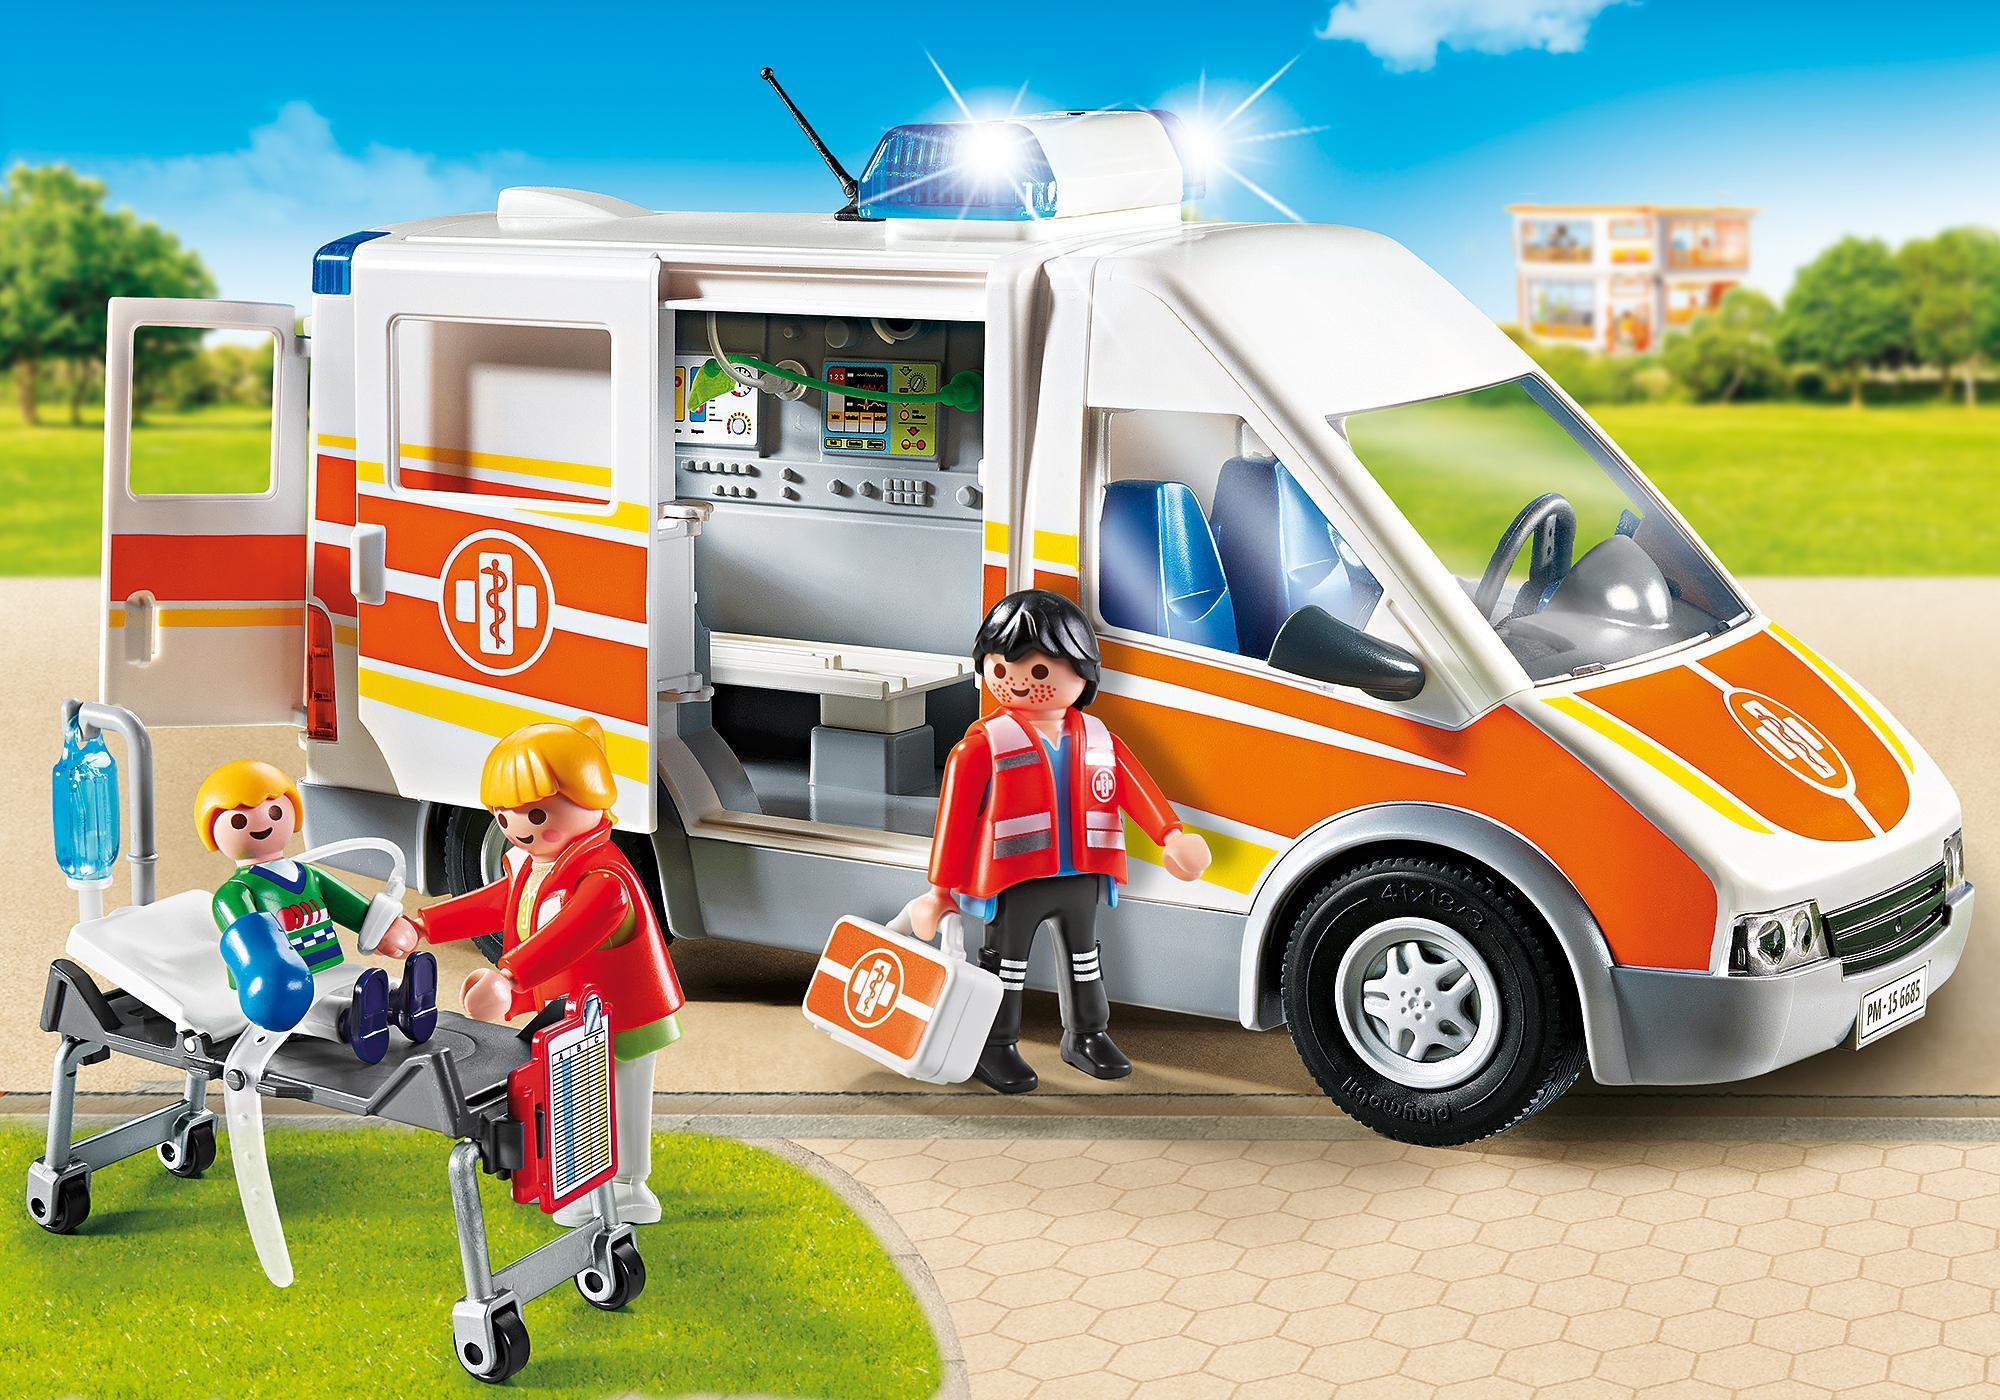 http://media.playmobil.com/i/playmobil/6685_product_detail/Ambulancia con Luces y Sonido